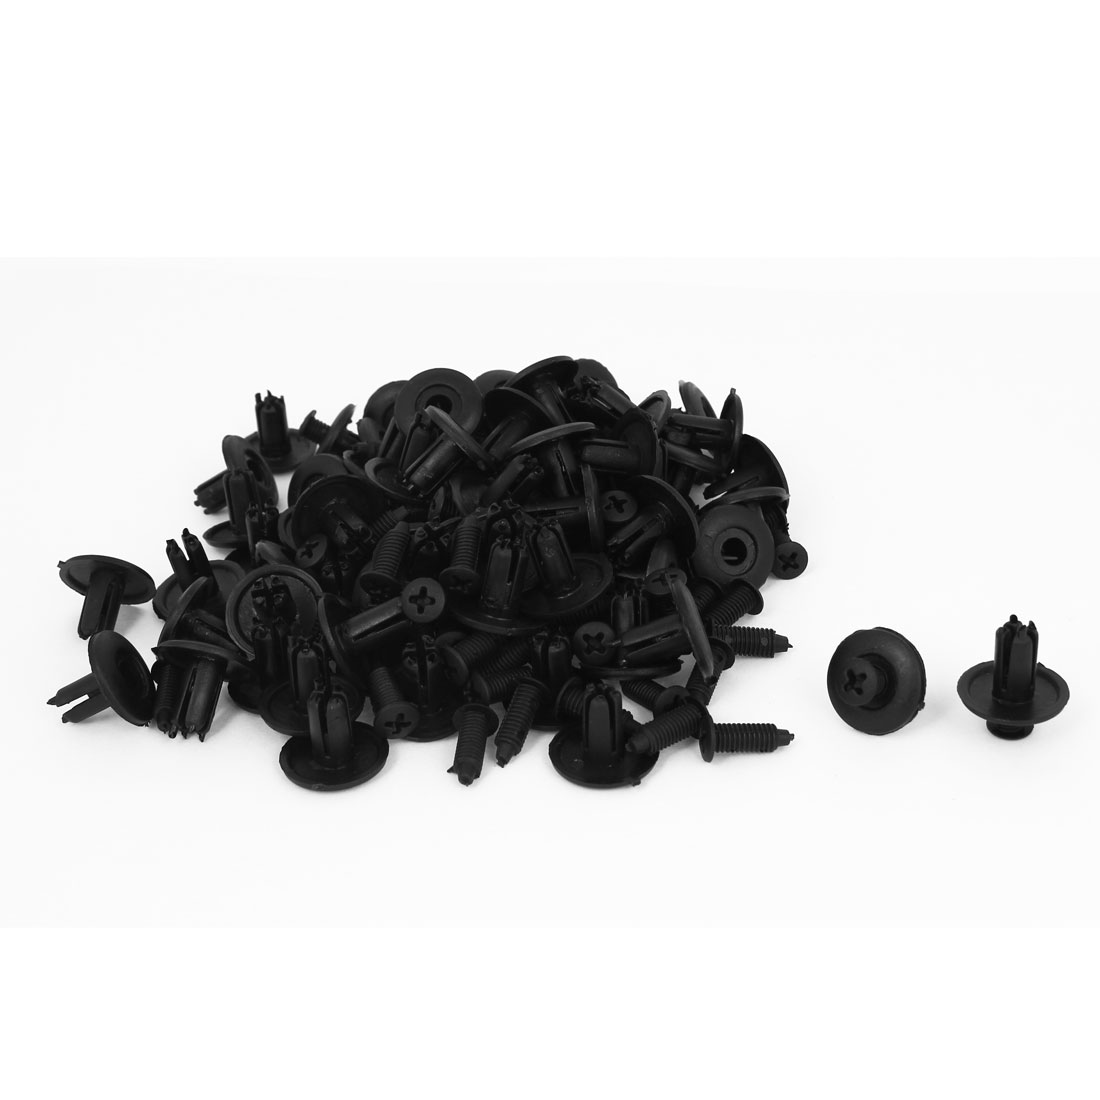 100 Pcs Black Plastic Rivet Trim Fastener Moulding Clips 7mm x 16mm x 21mm